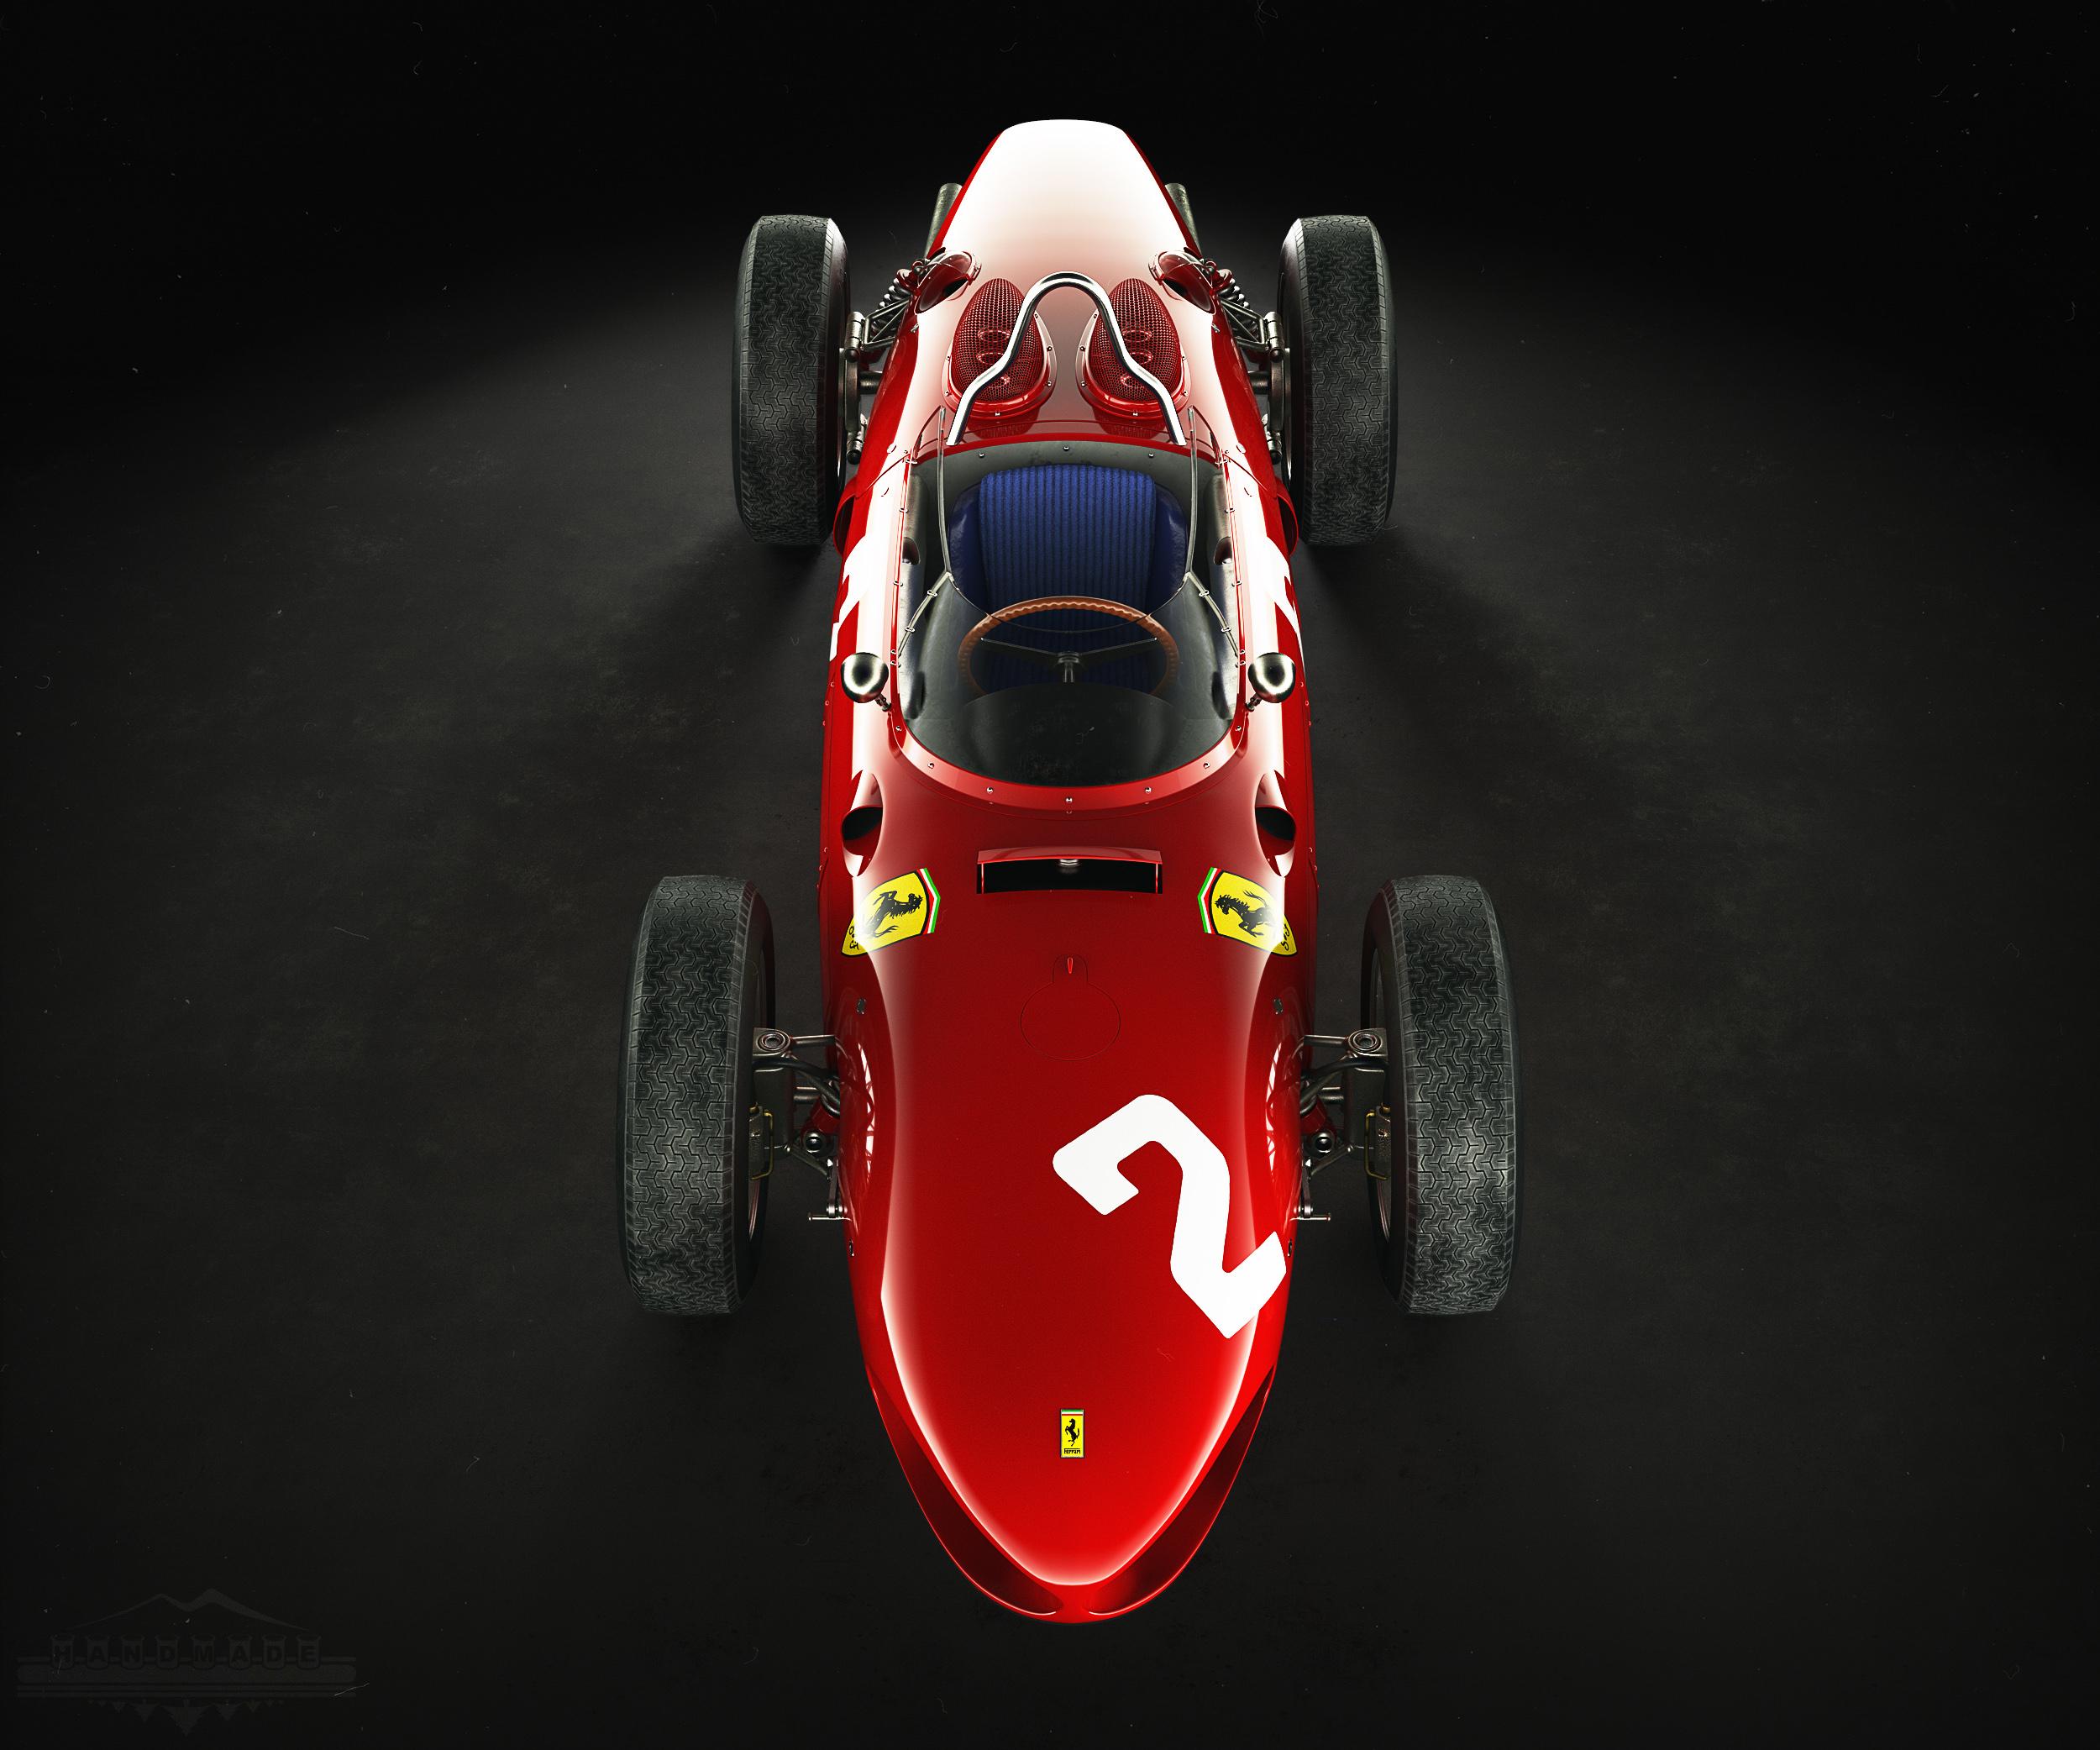 Ferrari 156 F1 Sharknose 1